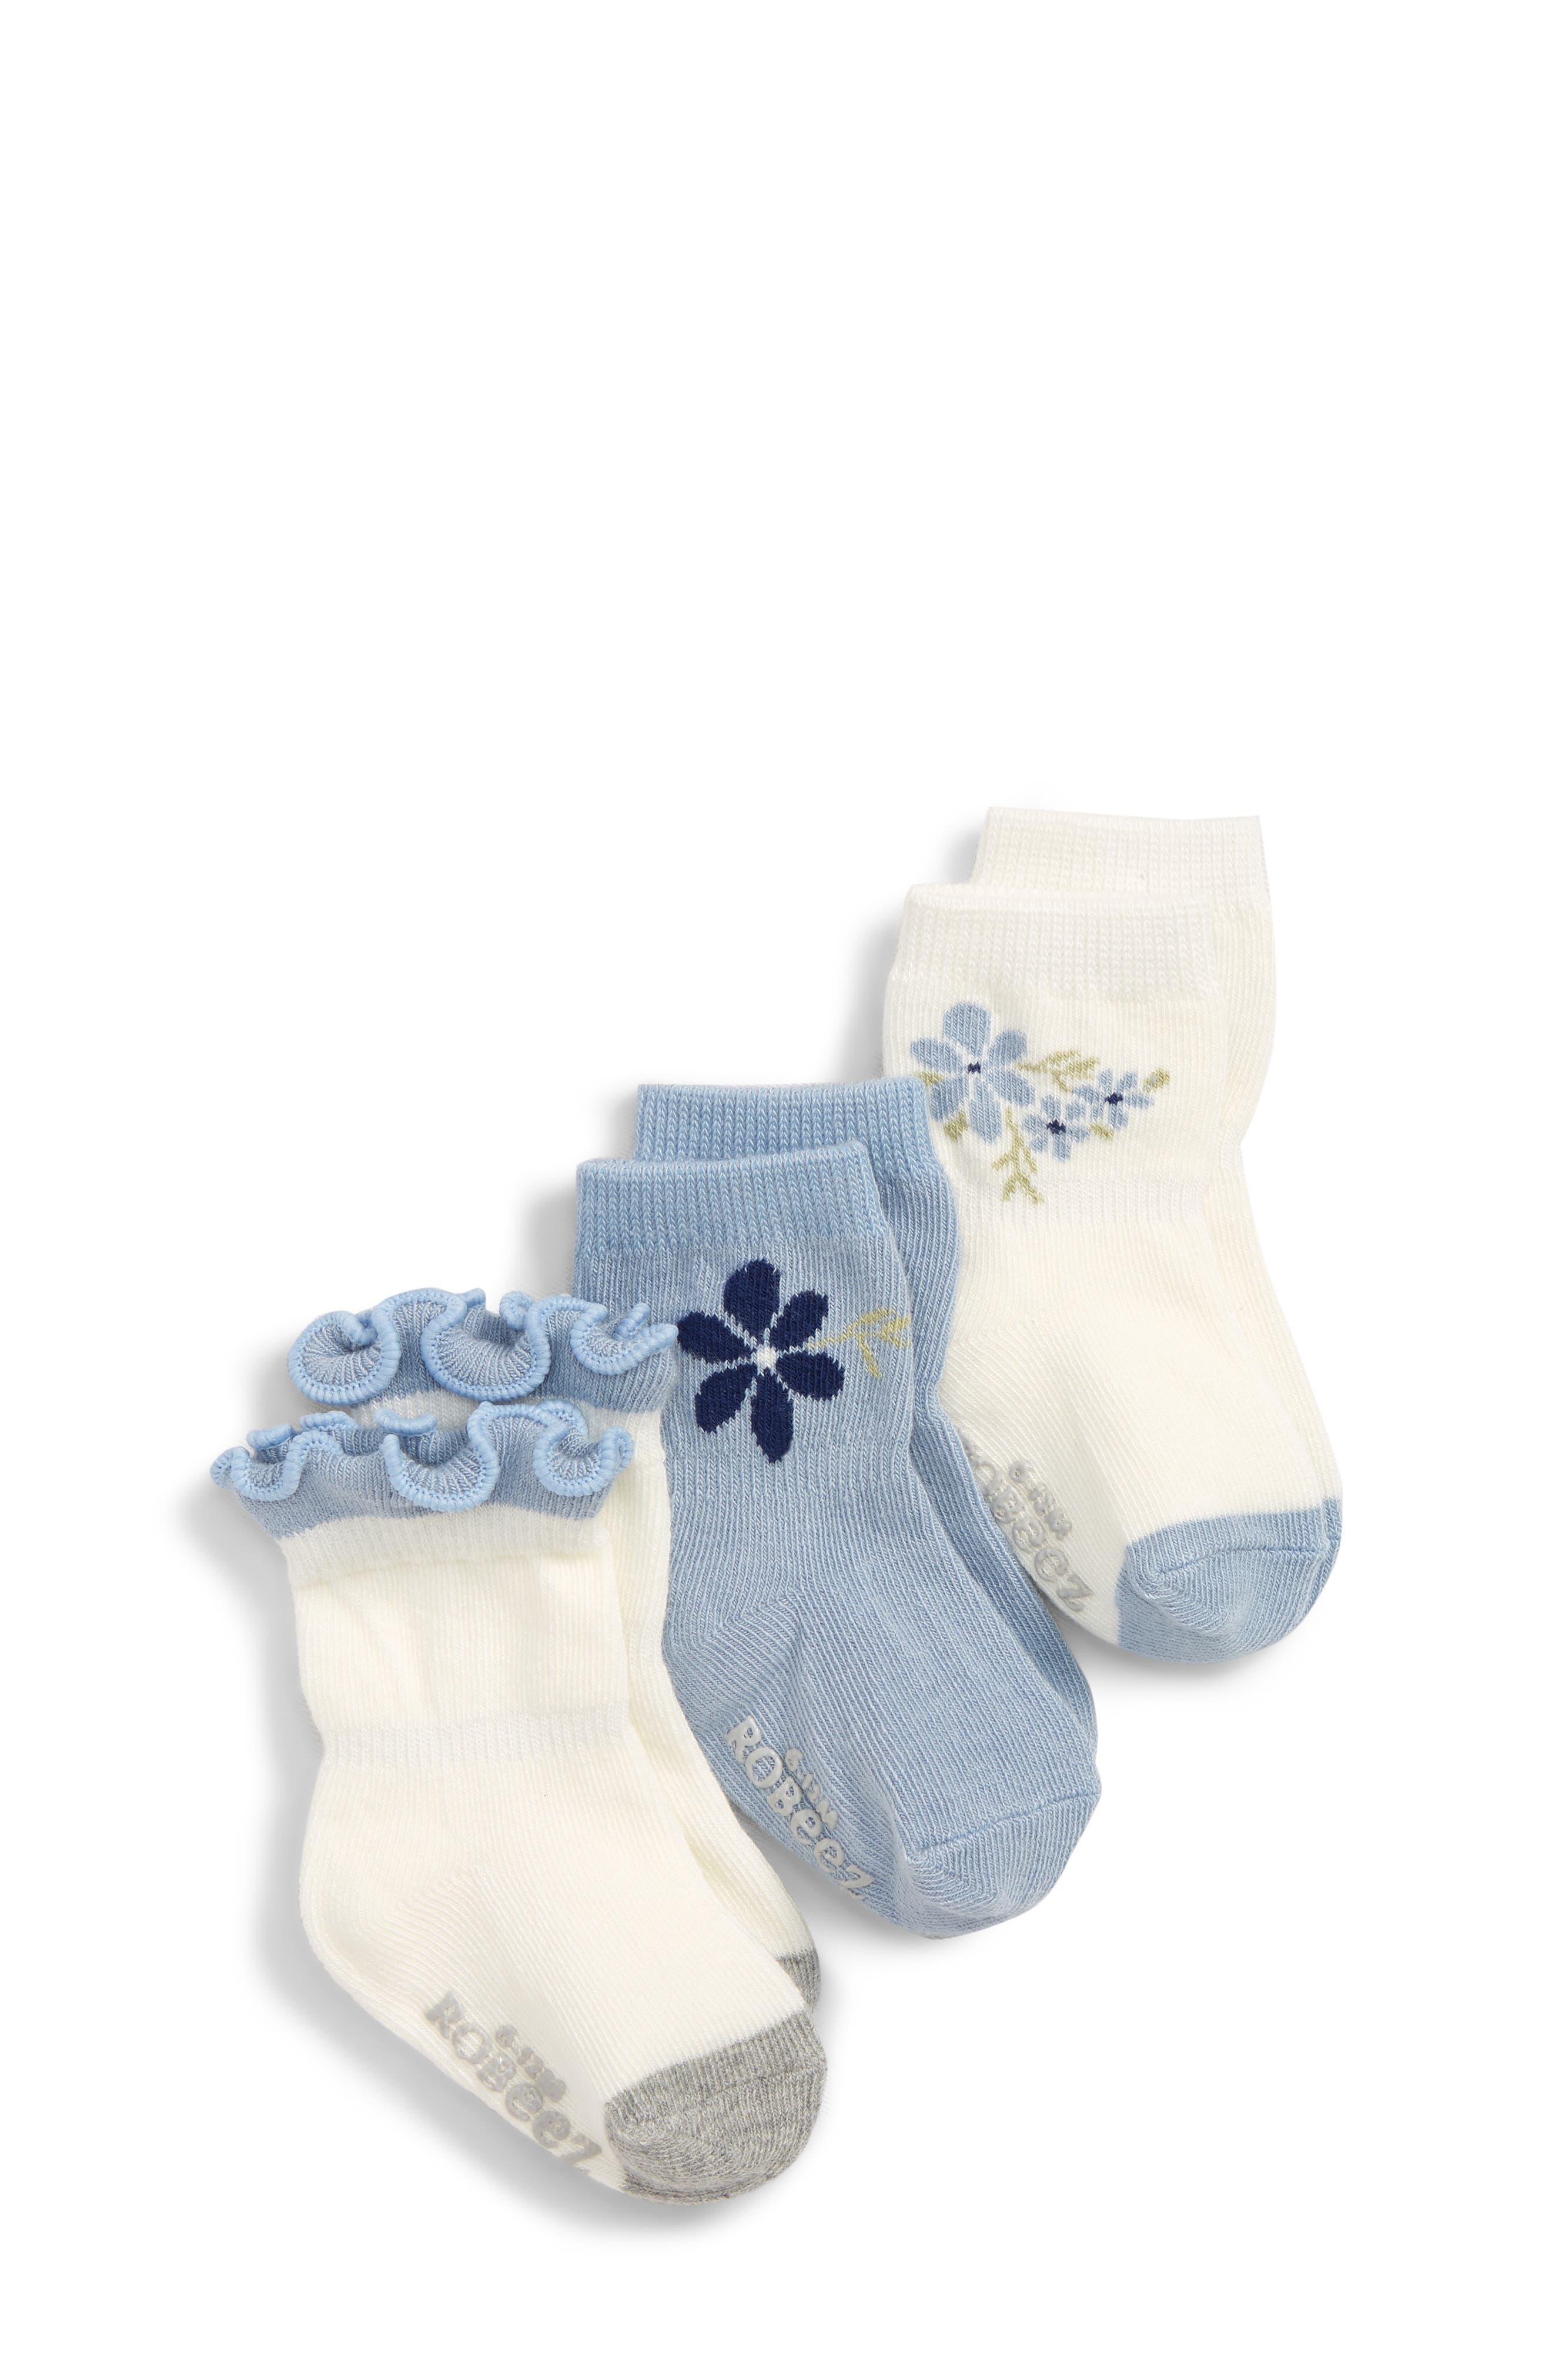 Pretty in Blue 3-Pack Ankle Socks,                             Main thumbnail 1, color,                             CREAM/ LIGHT BLUE